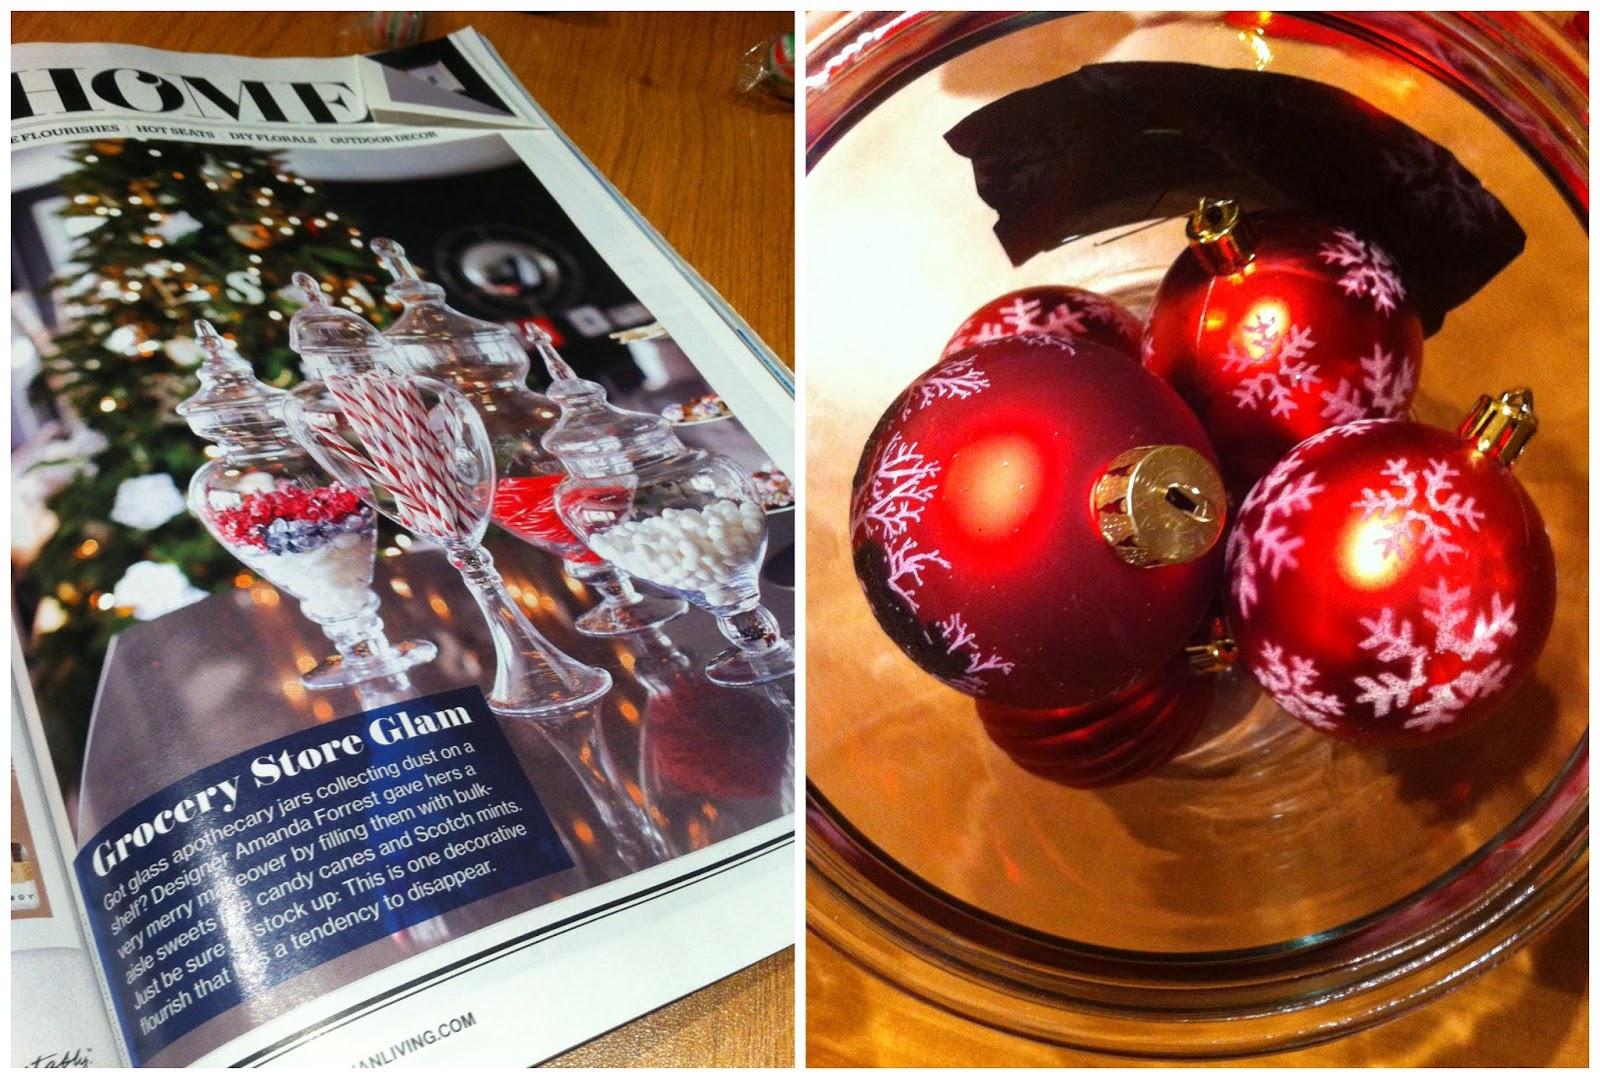 Christmas party decor // Gl jars! - NaNa Toulouse on seashells in bulk, toys in bulk, wine in bulk, pearl beads in bulk, pedestal bowls in bulk, bells in bulk, plastic necklaces in bulk, mirrors in bulk, votives in bulk, bead necklaces in bulk, hats in bulk, games in bulk, glass in bulk, planters in bulk, handkerchiefs in bulk, chargers in bulk, stationery in bulk, wholesale beads in bulk, flasks in bulk, craft beads in bulk,